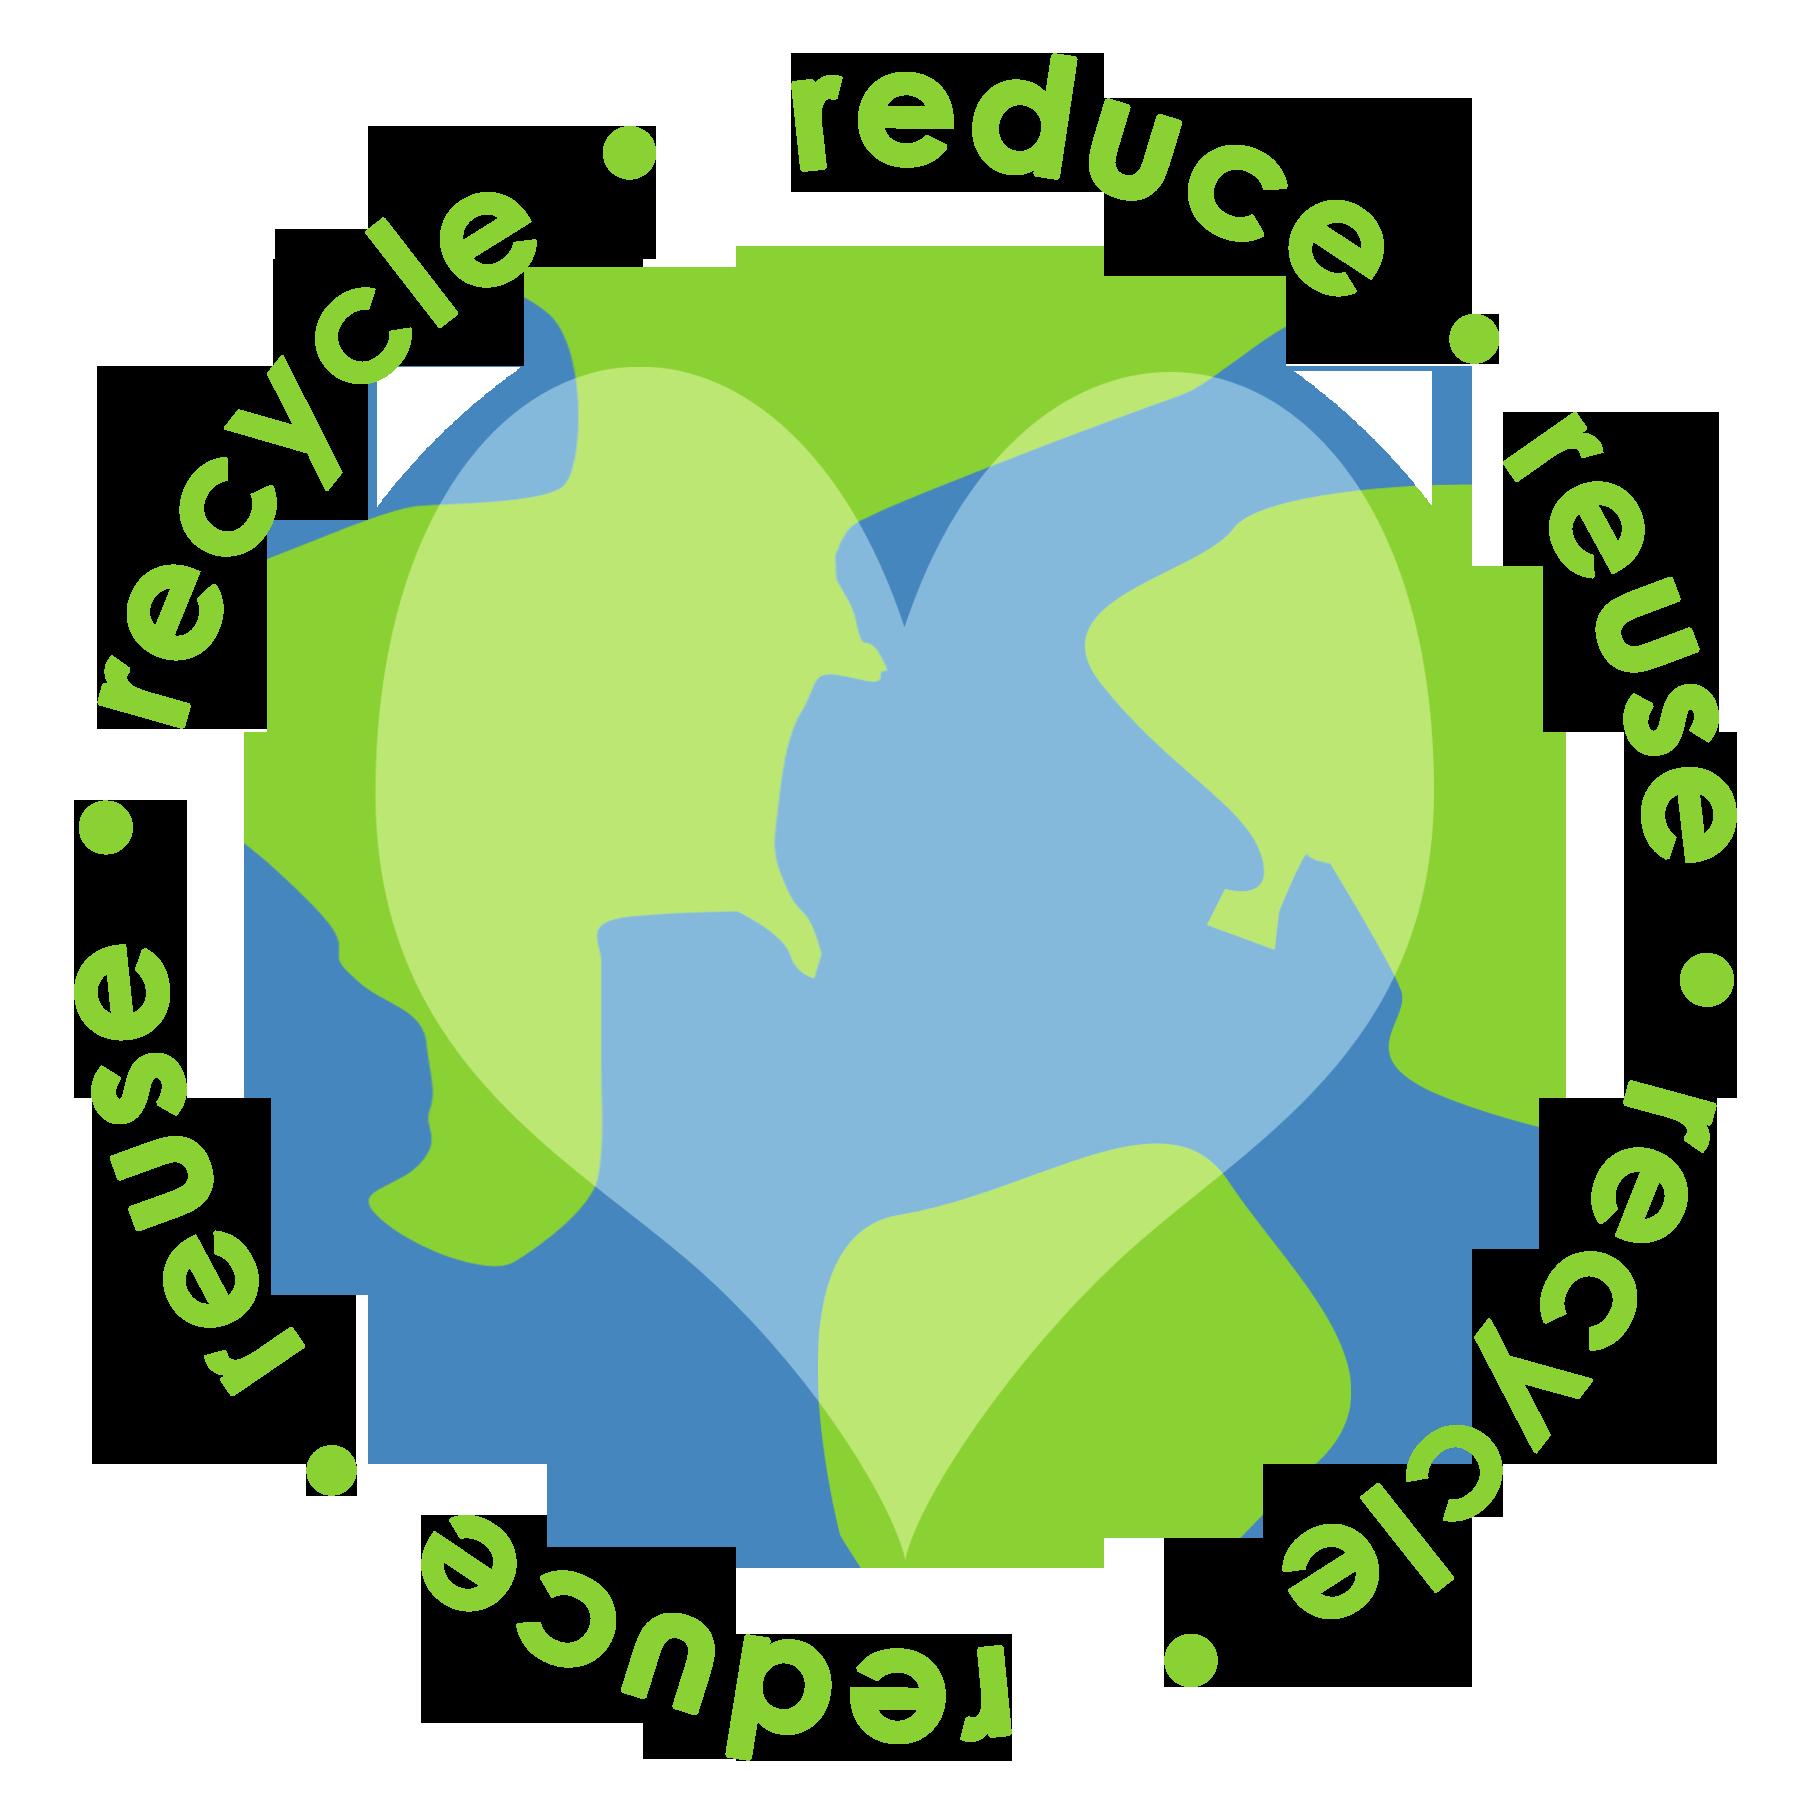 1800x1800 Reduce Reuse Recycle Transition Stourbridge